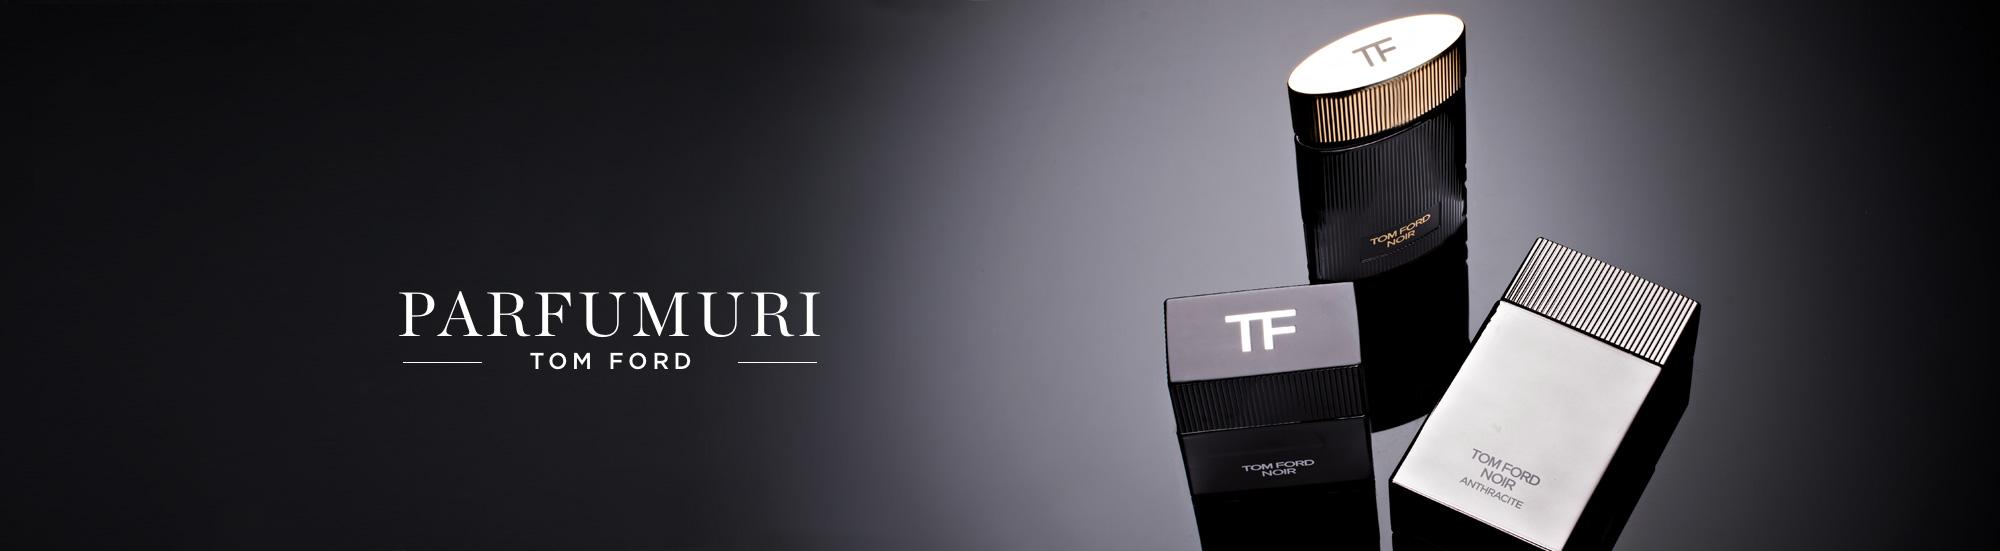 Tom Ford Parfumuri Bestvalue Duty Free Experience